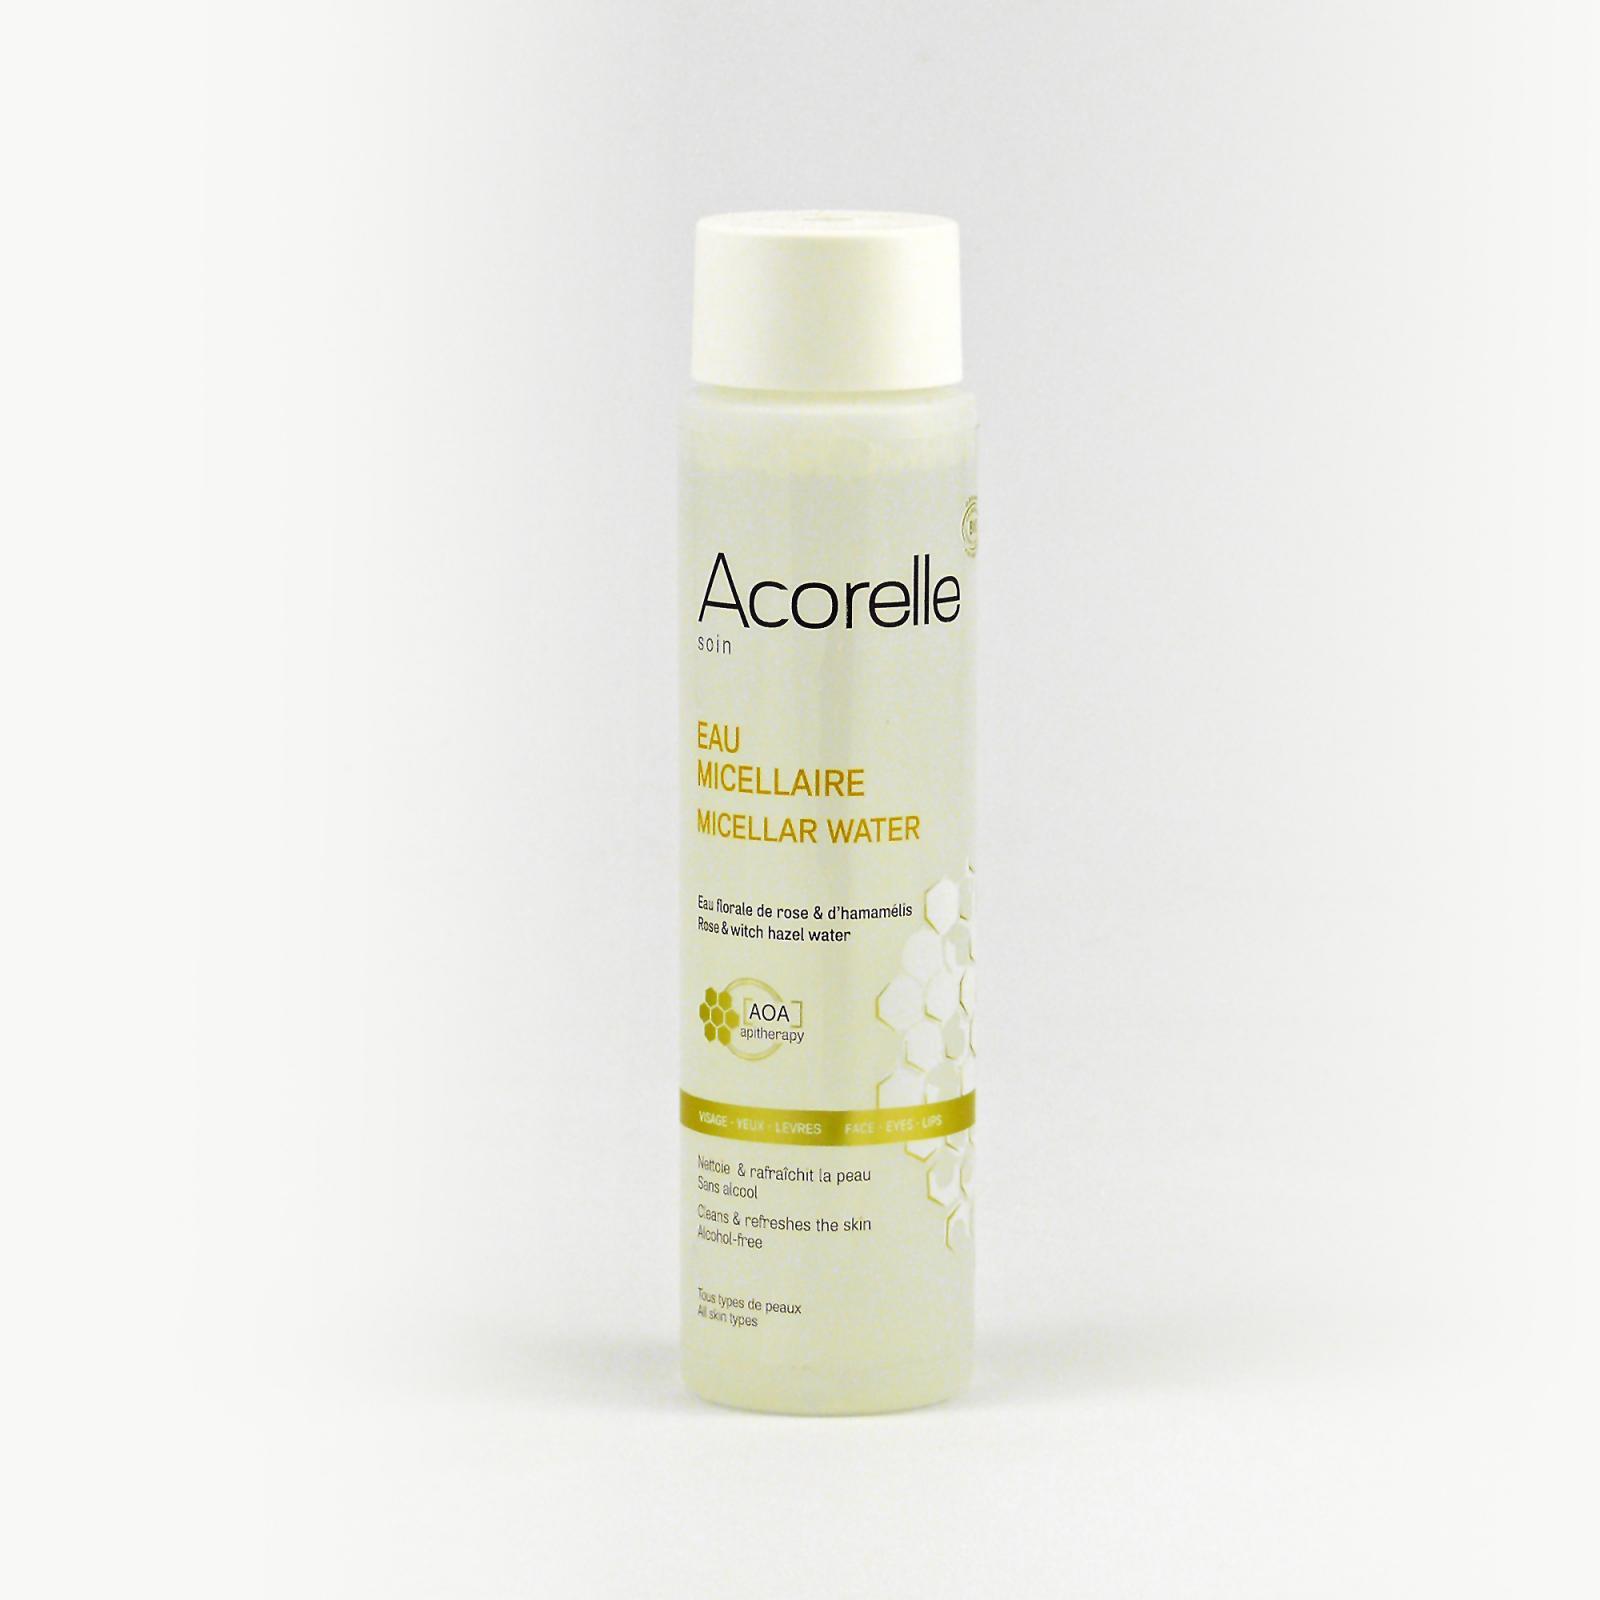 Acorelle Micelární voda s propolisem, Komplex AOA 150 ml